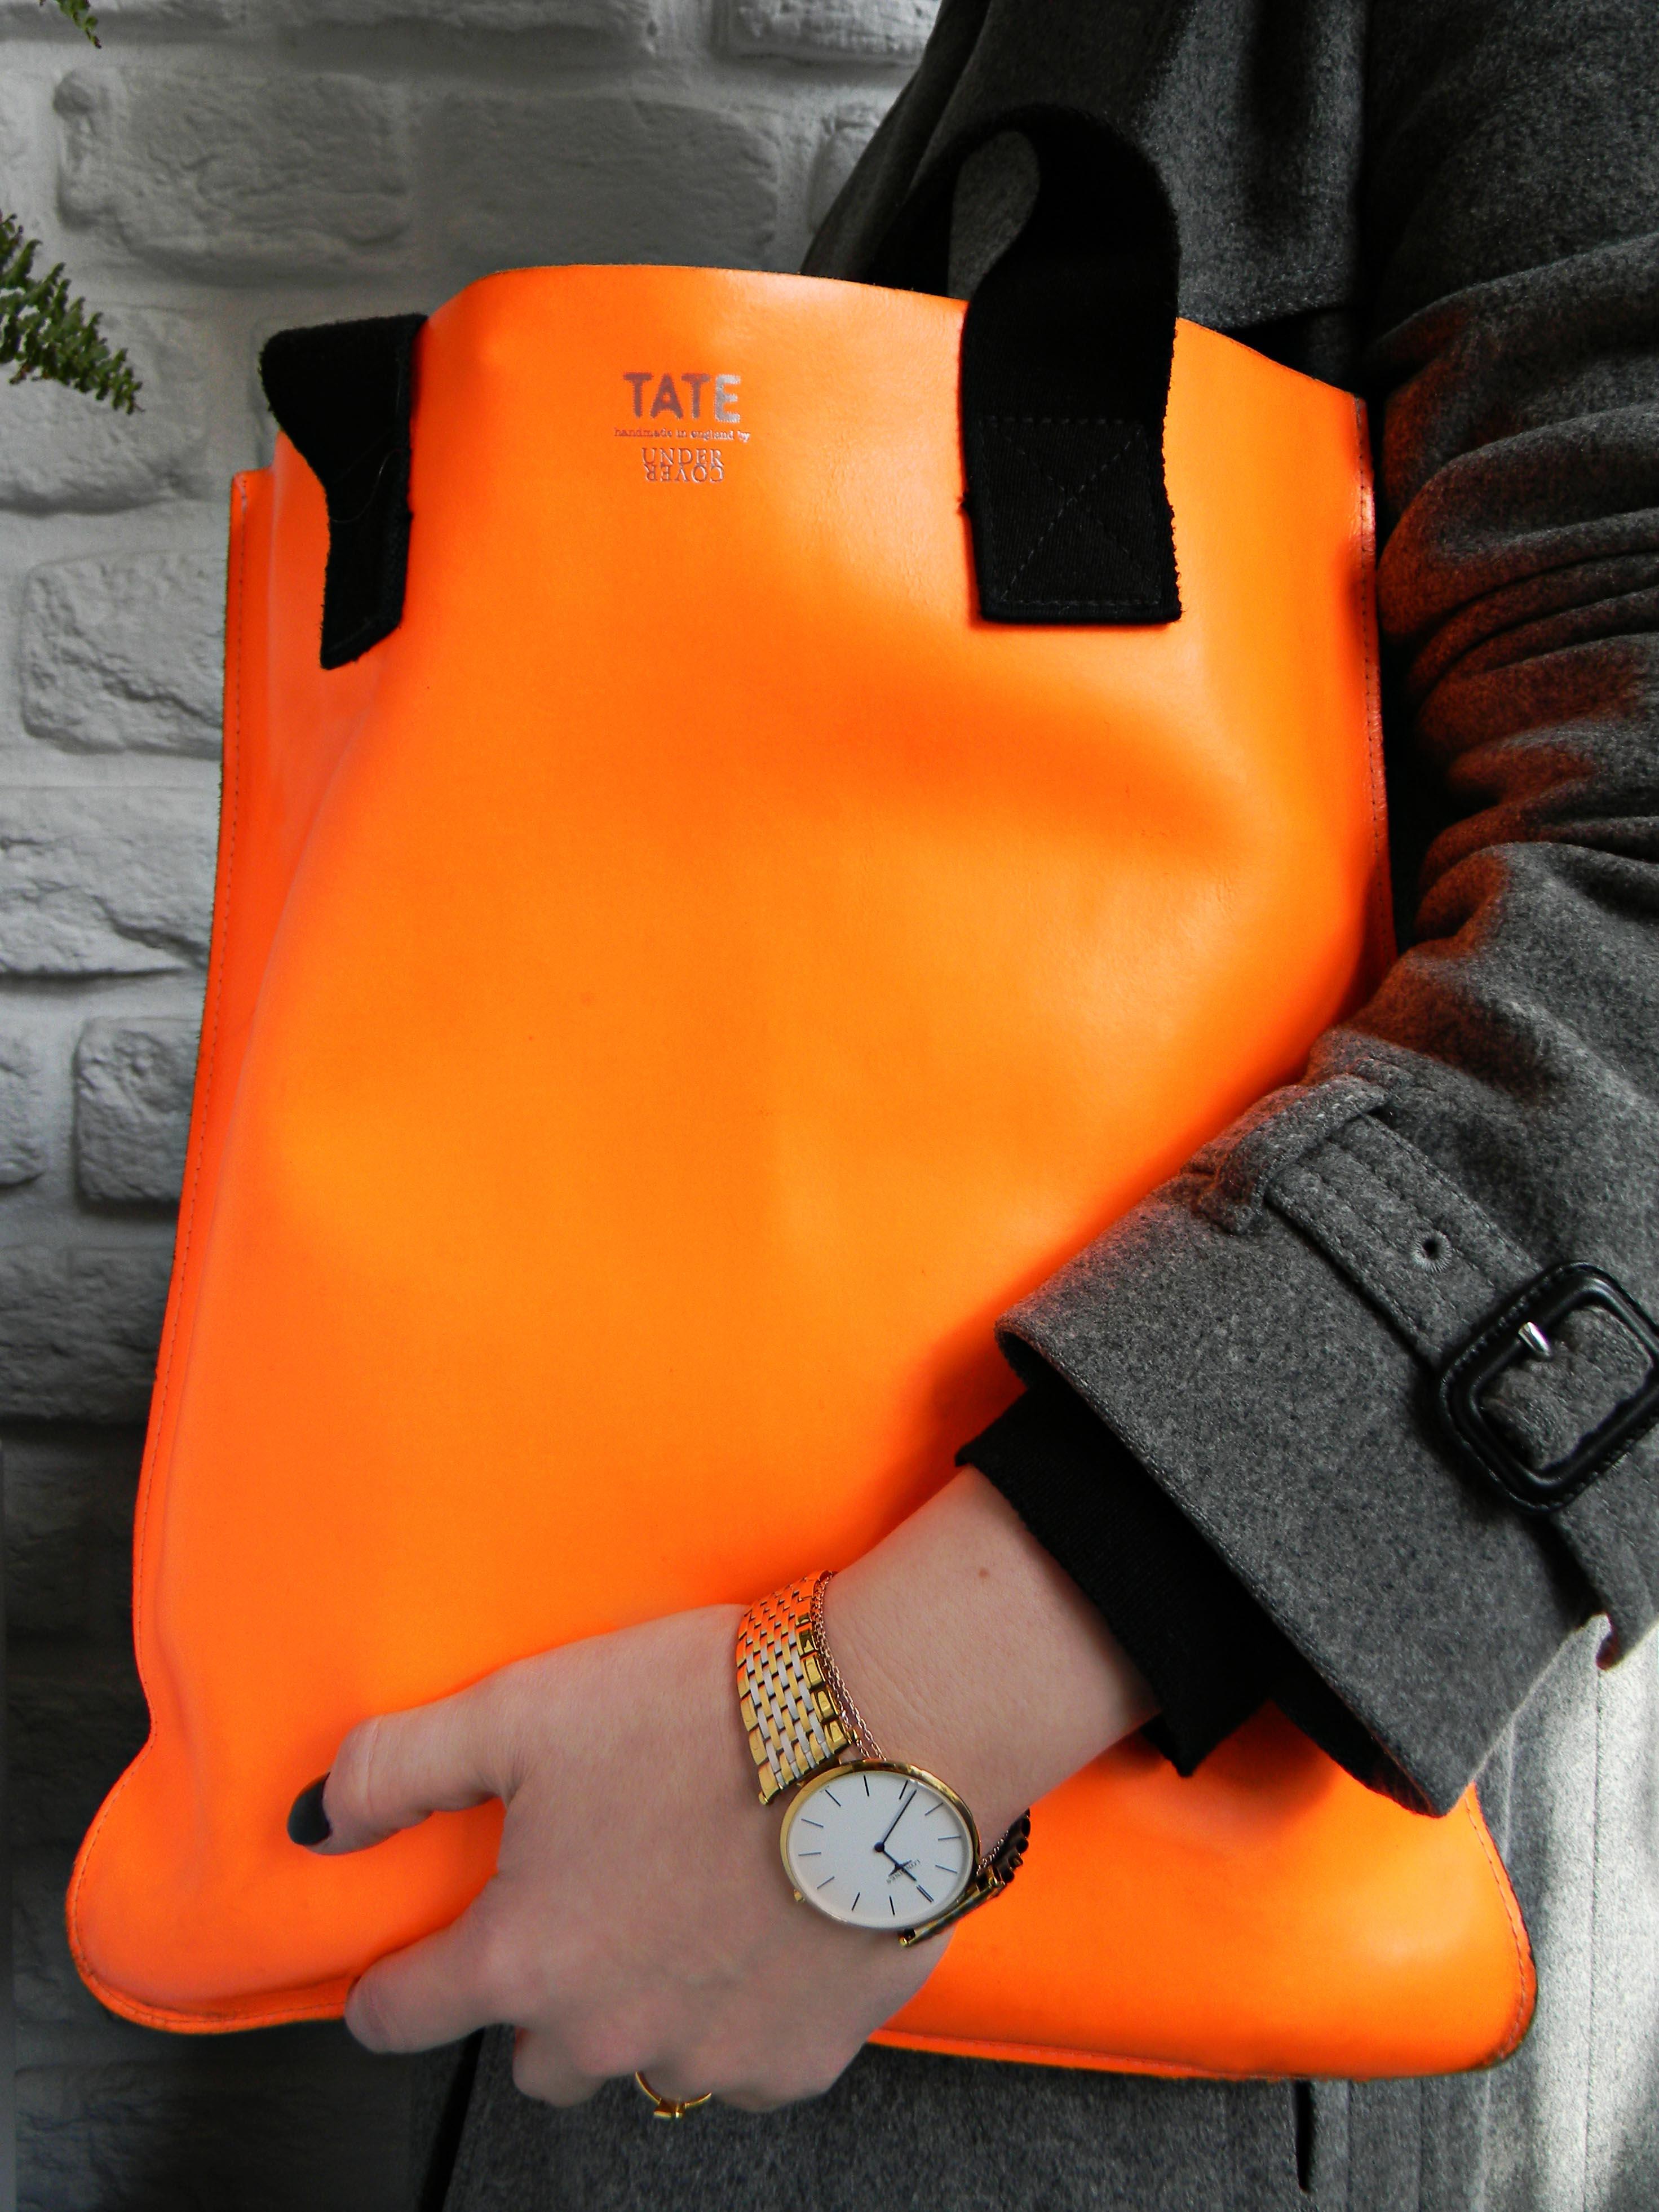 Tate Modern bag